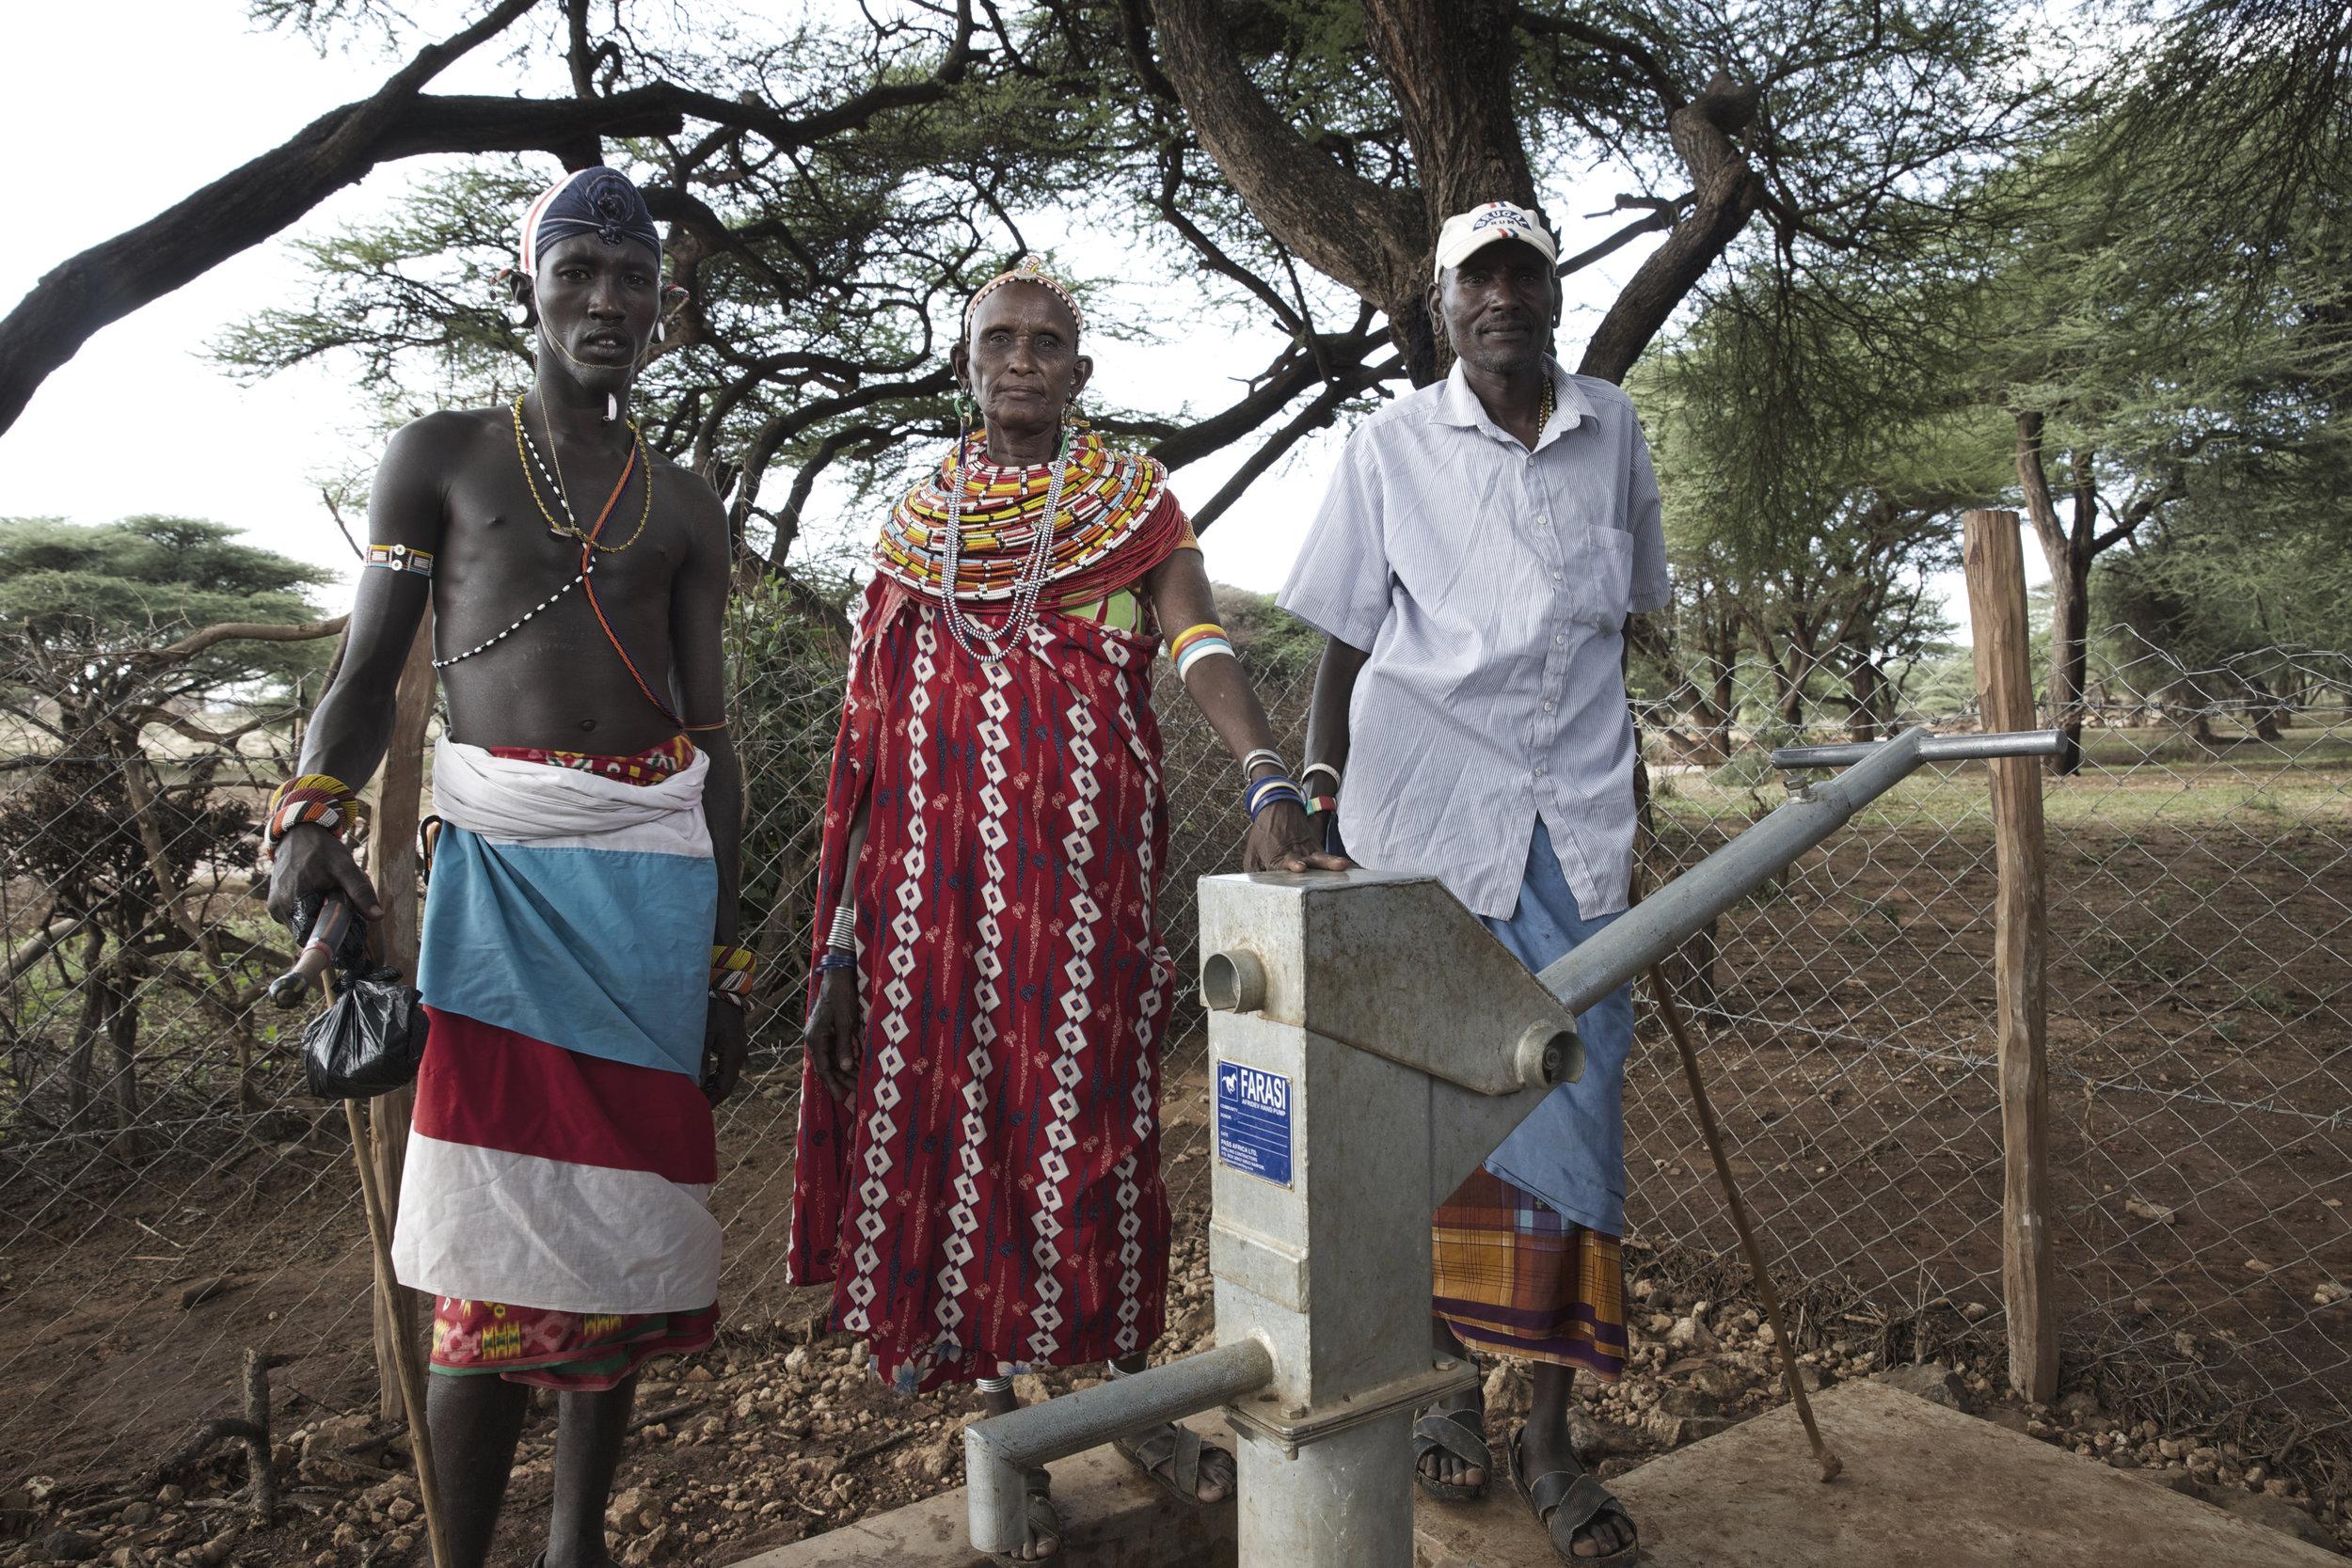 Community Leaders by water well, Samburu Kenya Africa